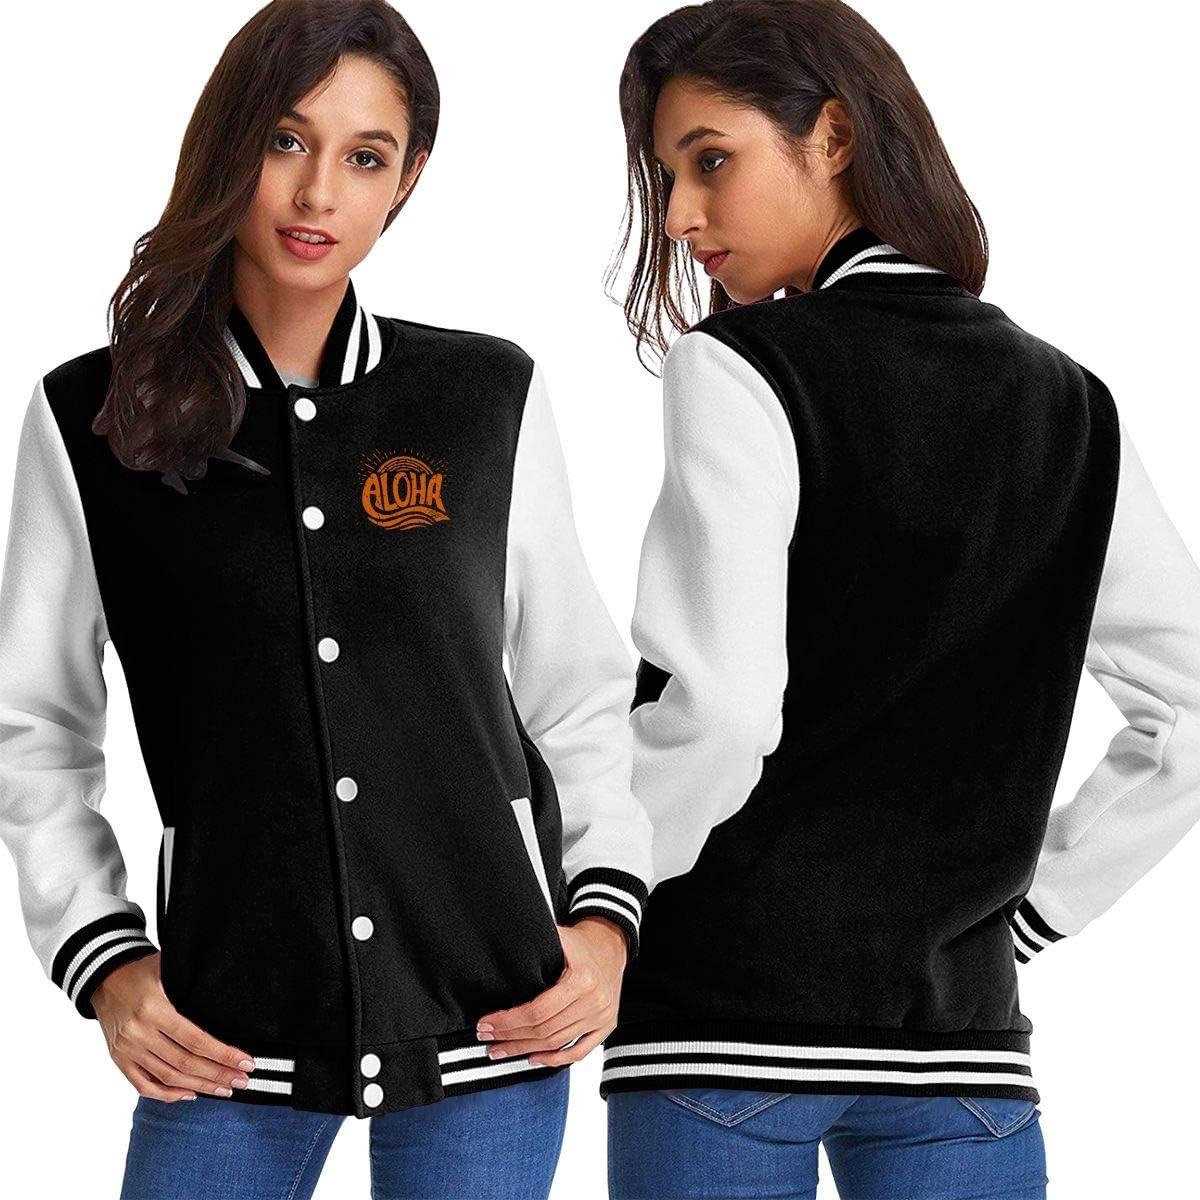 Aloha Super intense SALE Womens Baseball Uniform Coat Ranking TOP9 Sweatshirt Sport